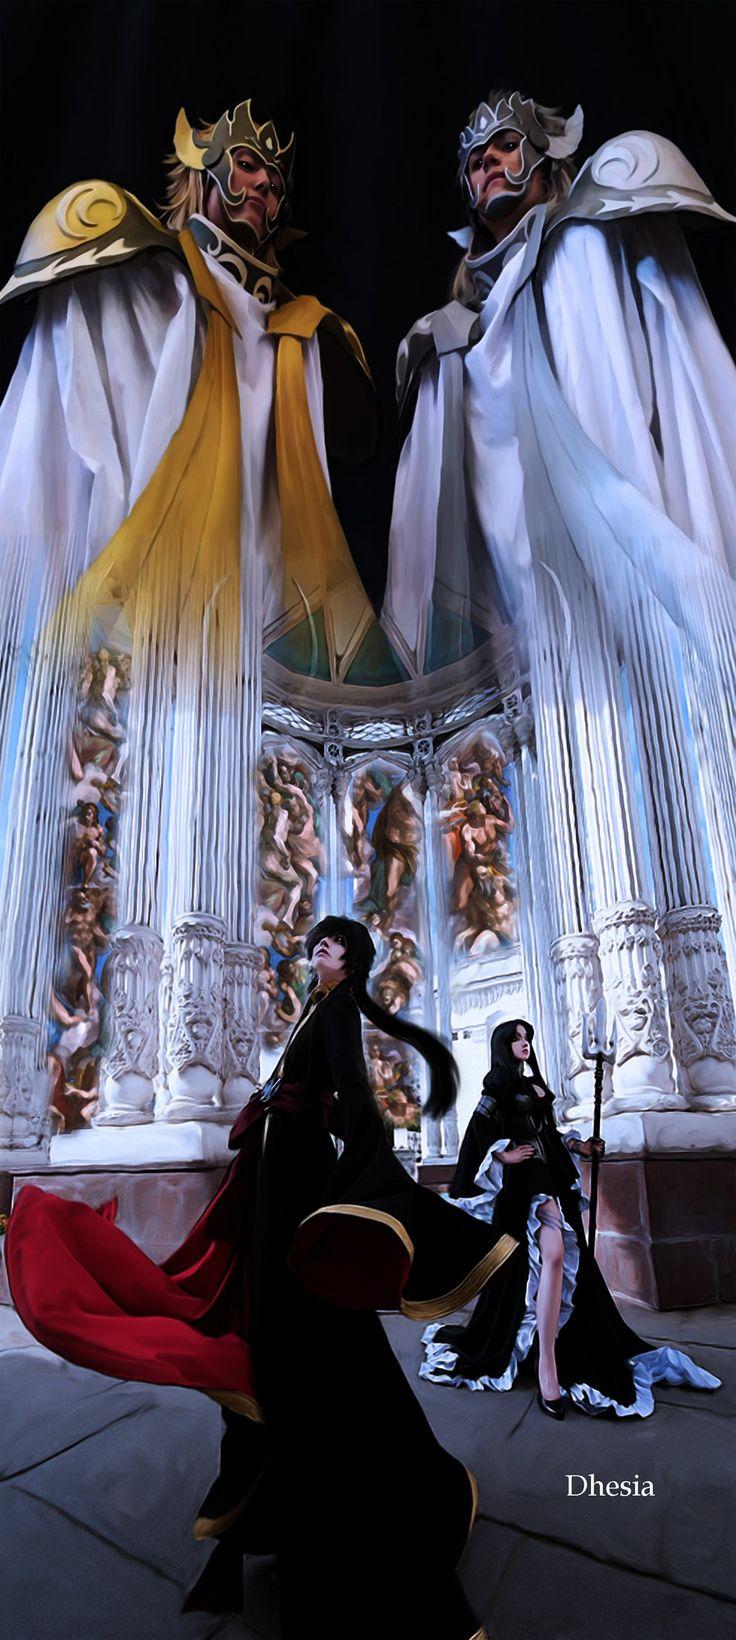 Saint Seiya The Lost Canvas - by Dhesia.deviantart.com on @DeviantArtSaint Seiya Lost Canvas @ Masami Kurumada, Shiori Teshirogi Thanatos and Hypnos model@ Geminicosplay -  geminicosplay.deviantart.com/ Aron and Pandora model @ Geshapetrovich - geshapetrovich.deviantart.com/